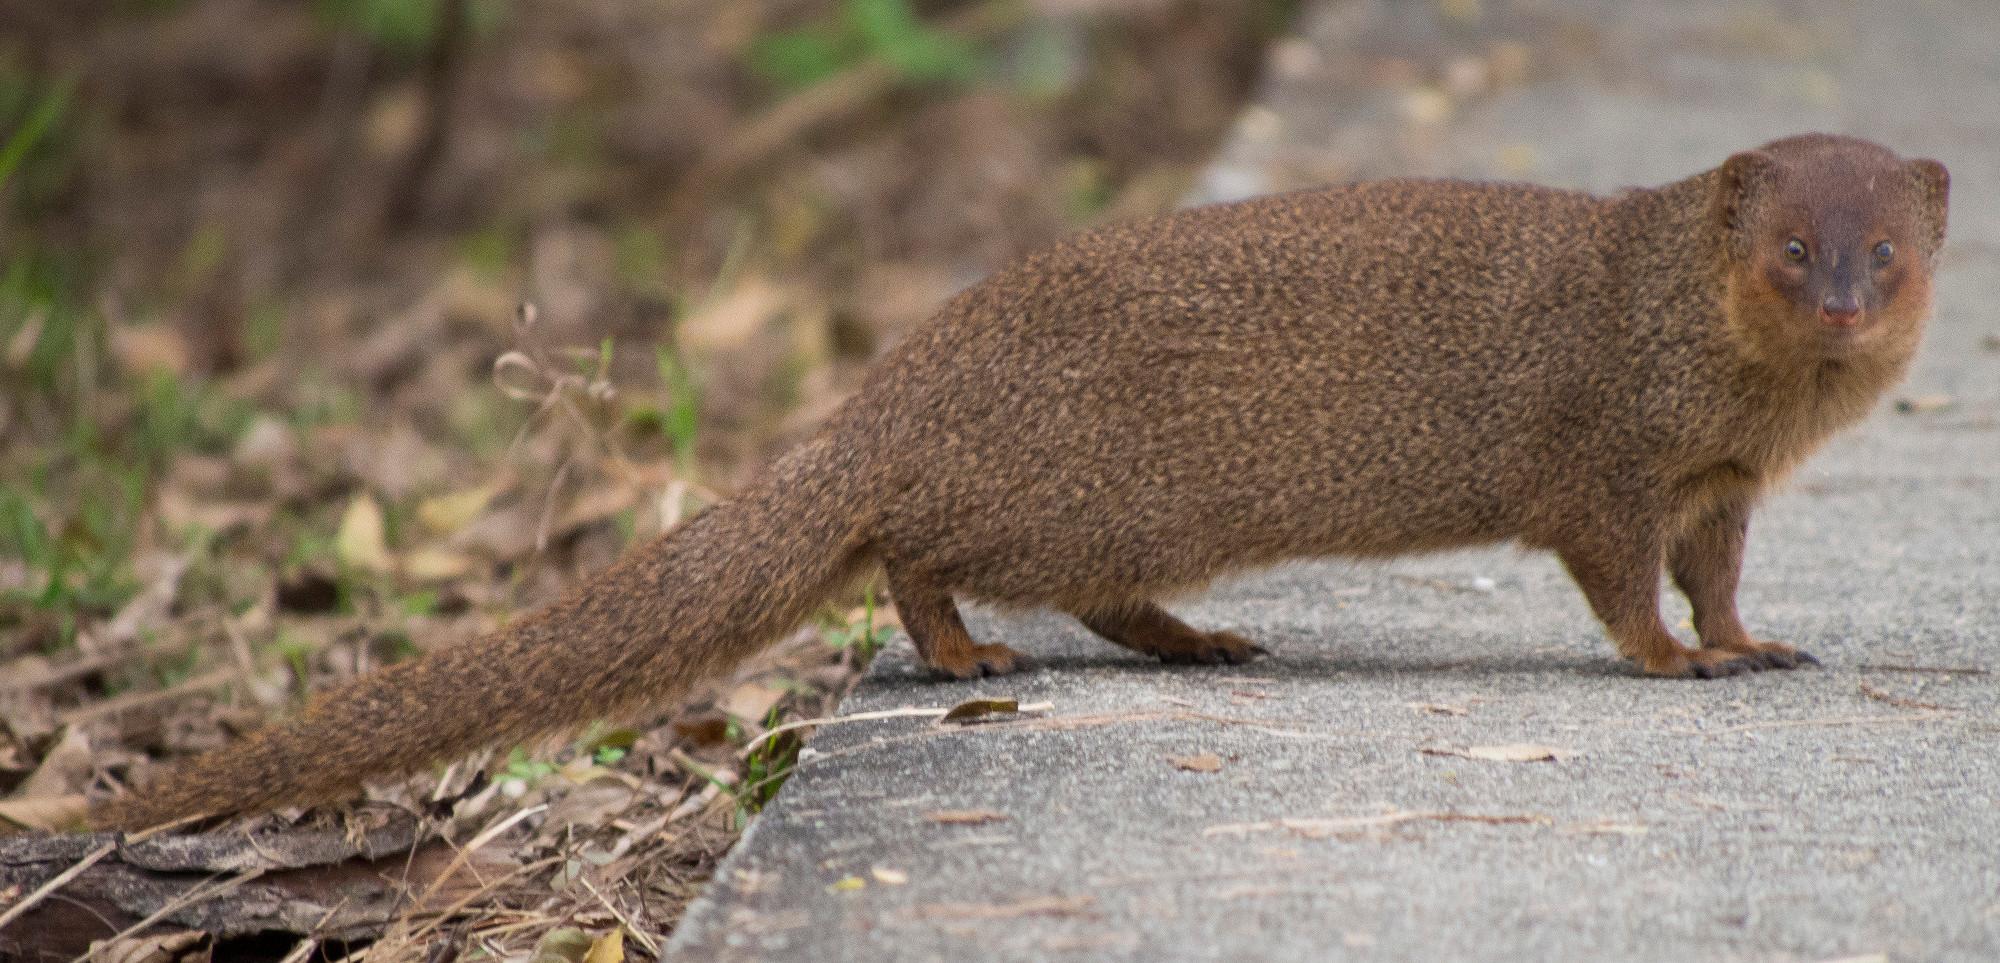 Javan mongoose - Wikipedia